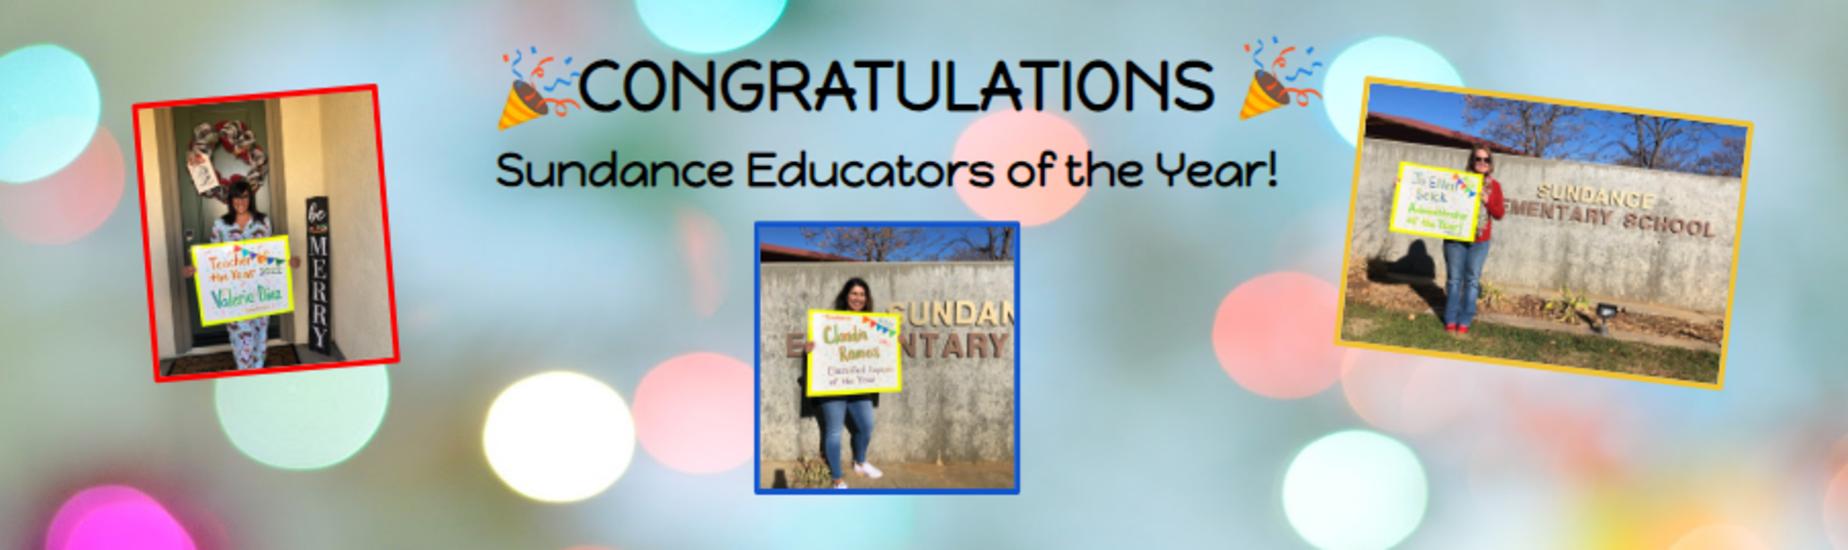 Sundance Educators of the Year!